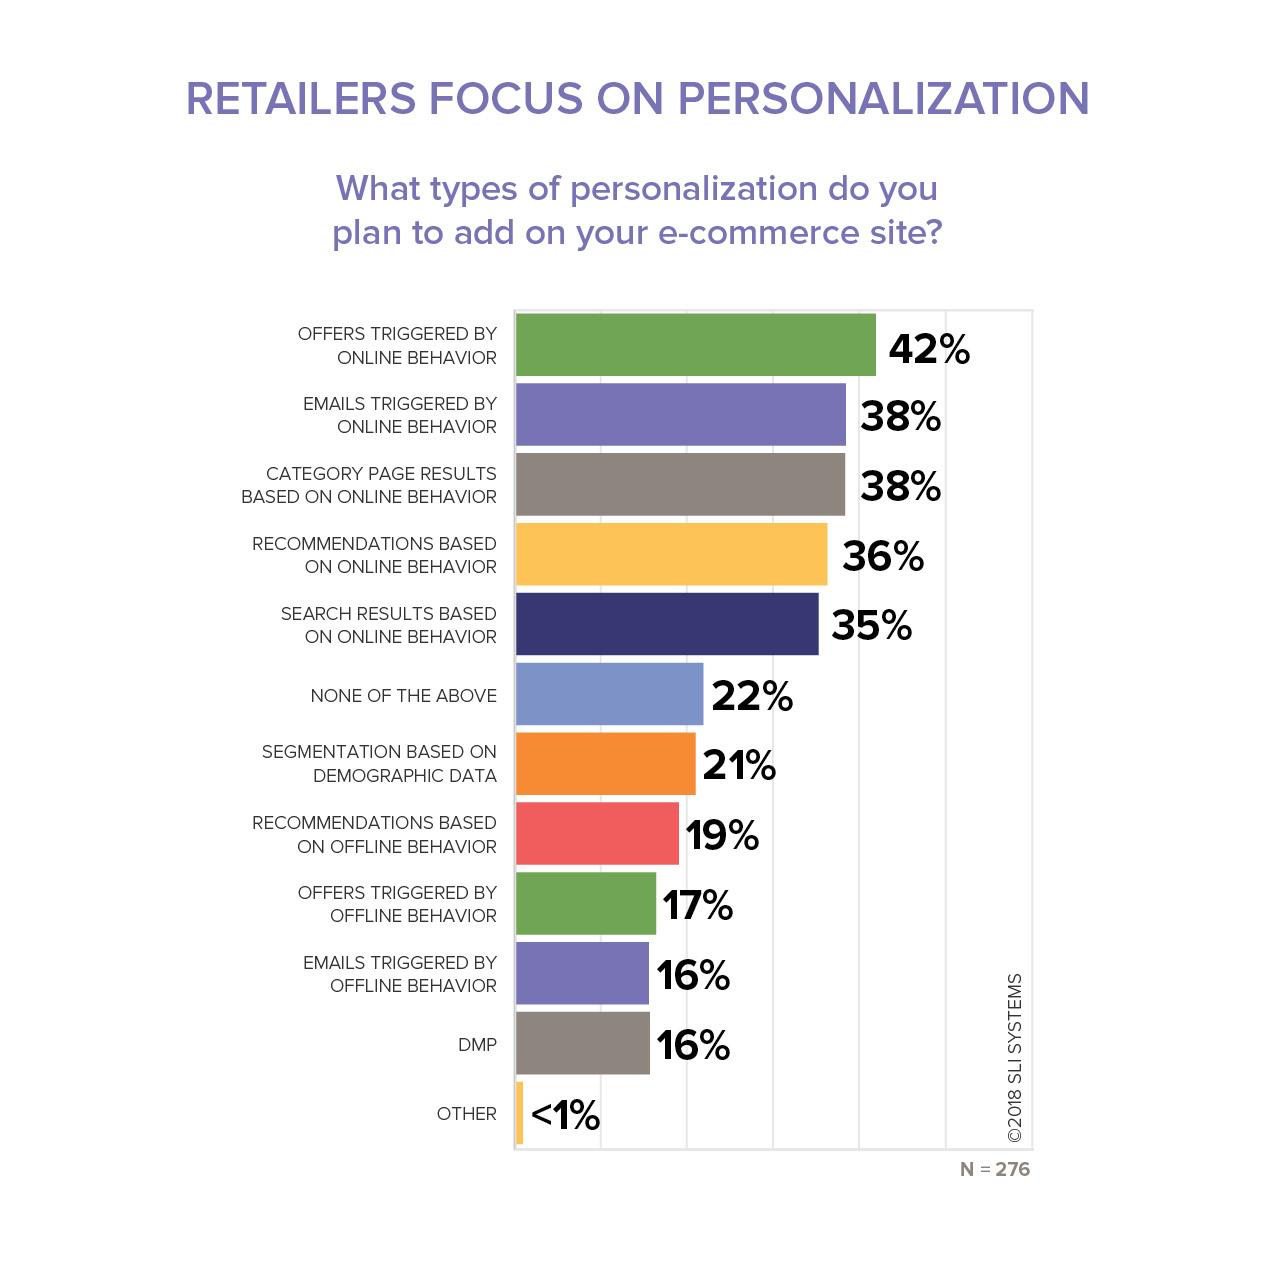 Retailer Focus on Personalization